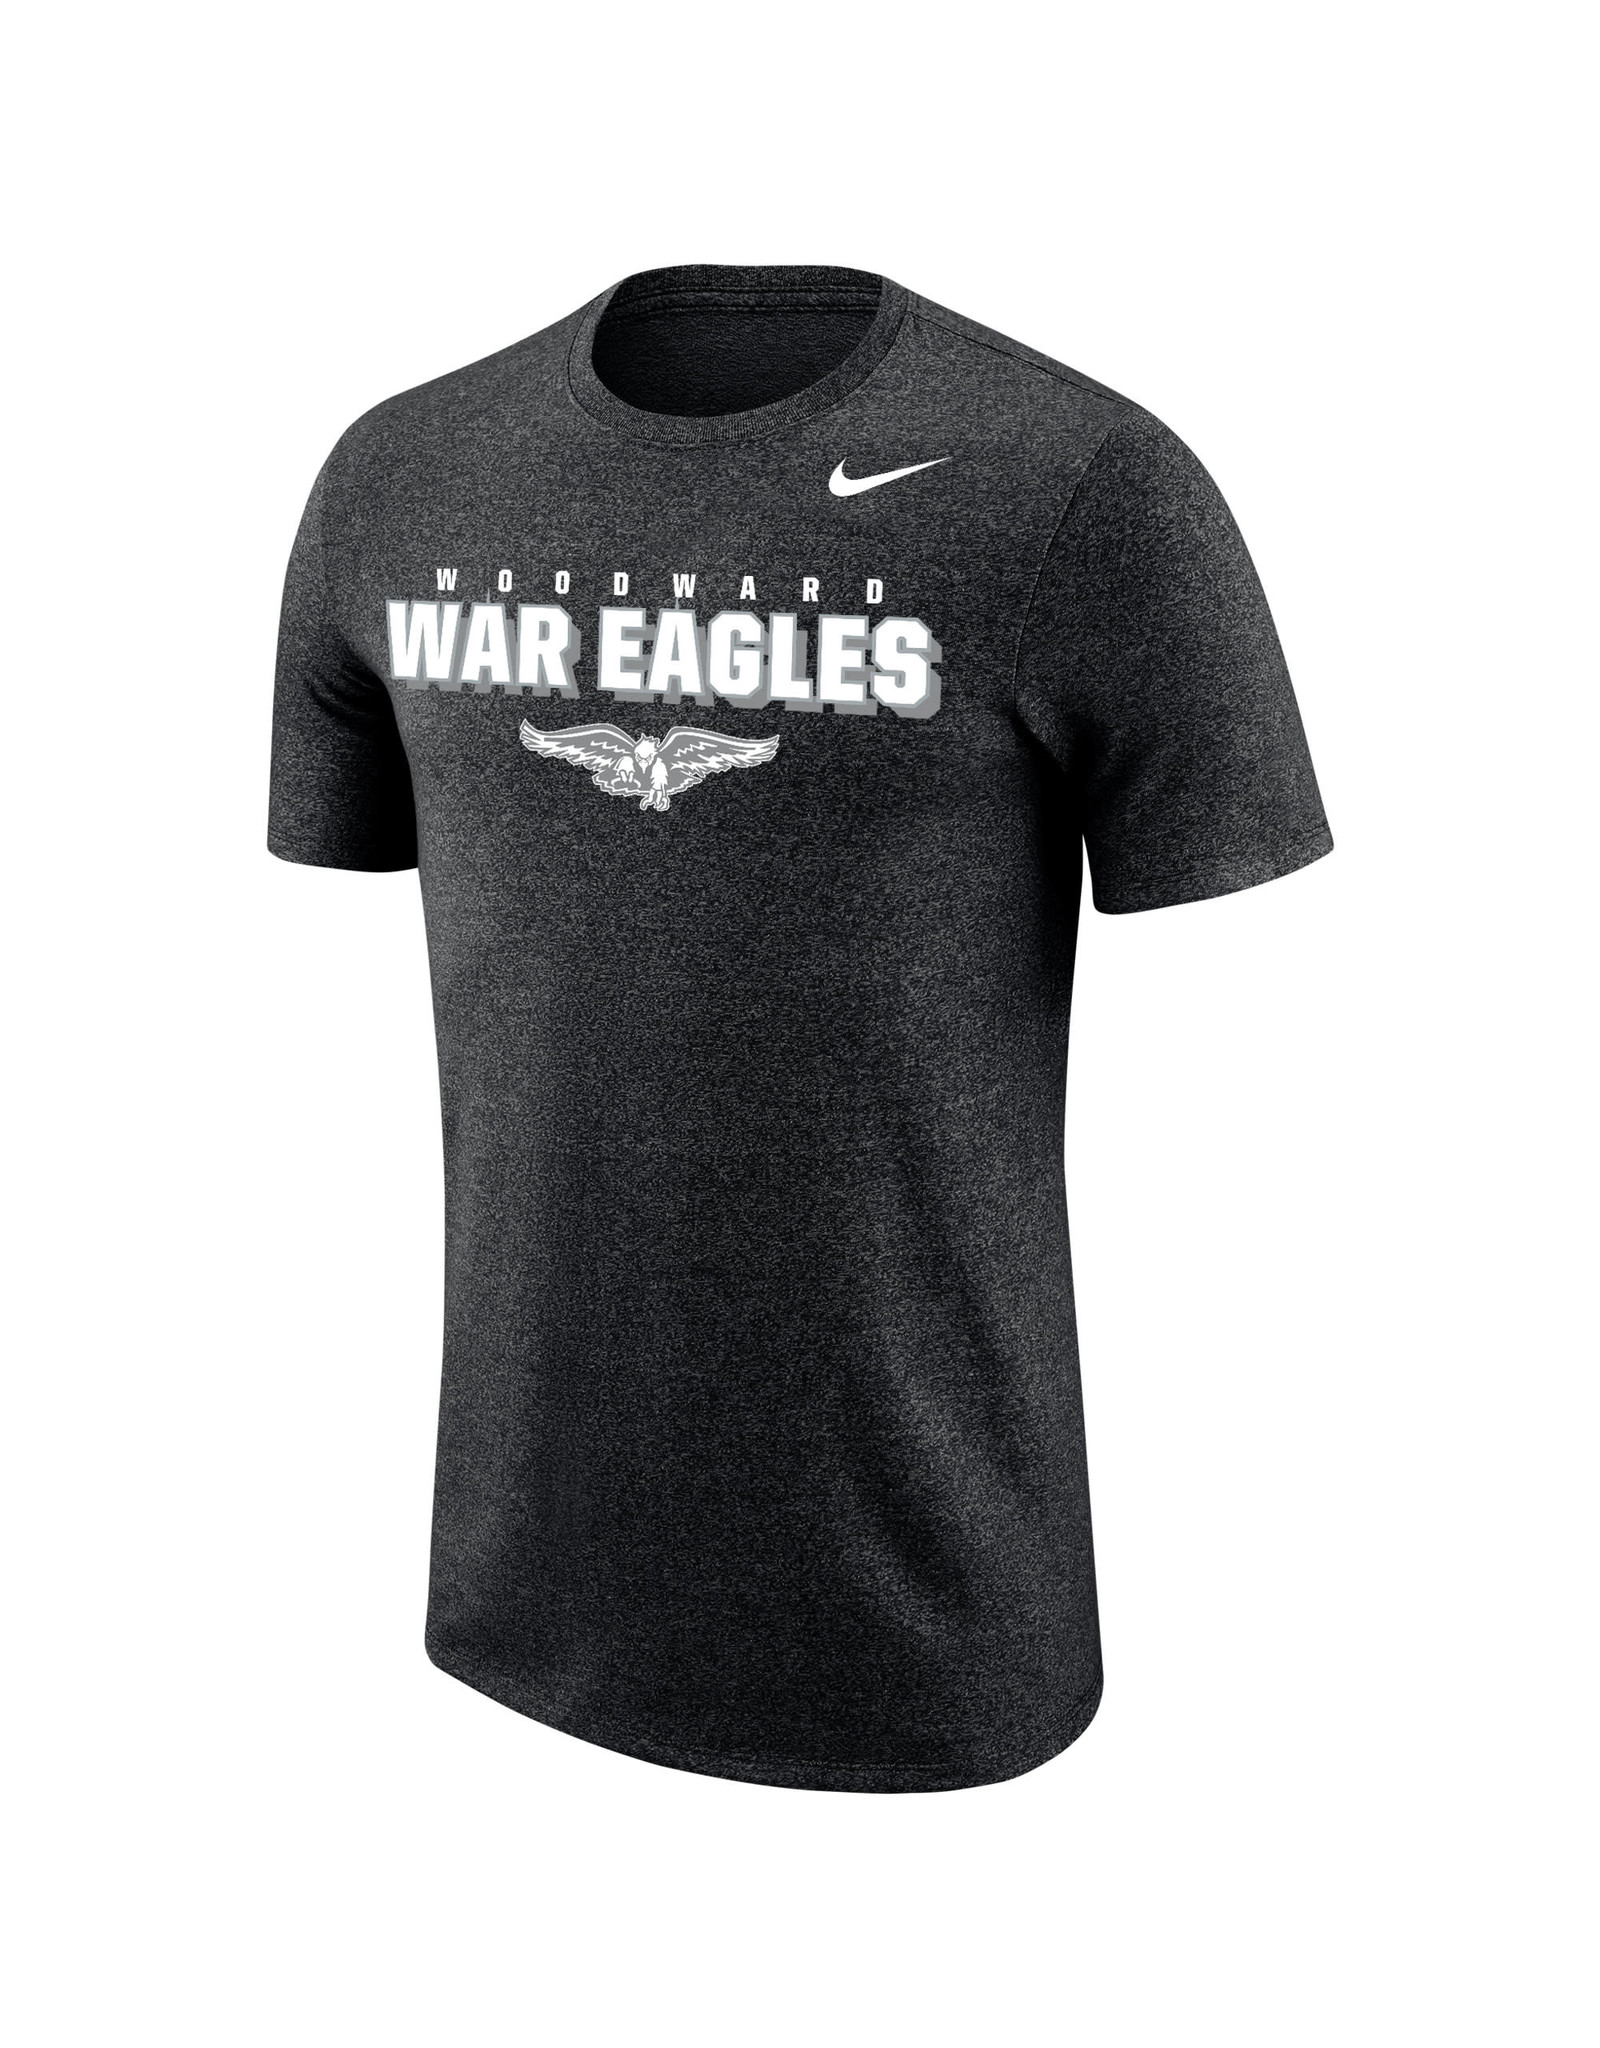 NIKE Marled SS T Shirt in Black Heather